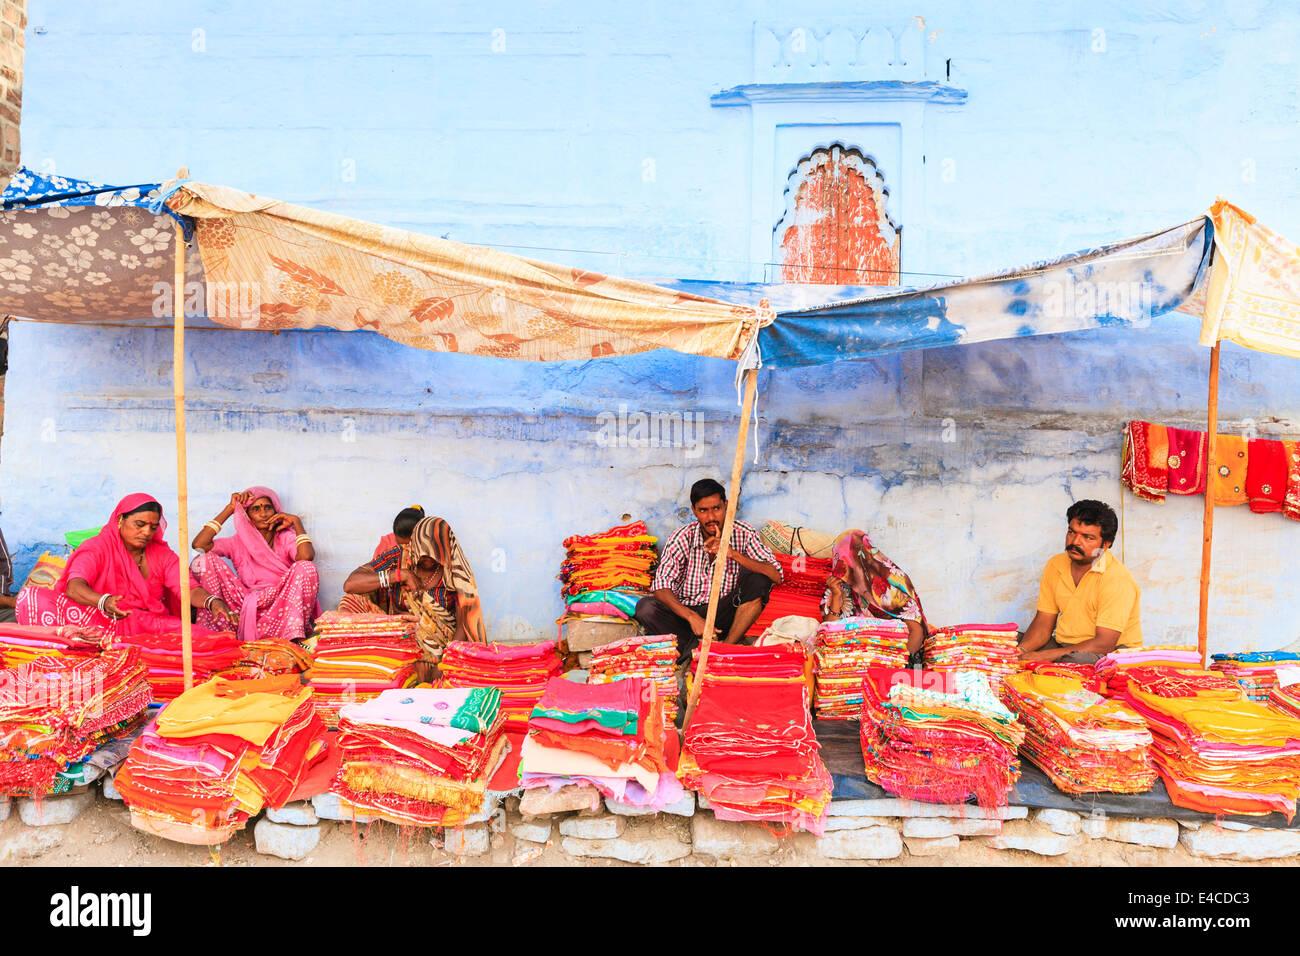 Seide Stall, Jodhpur, Rajasthan, Indien Stockbild